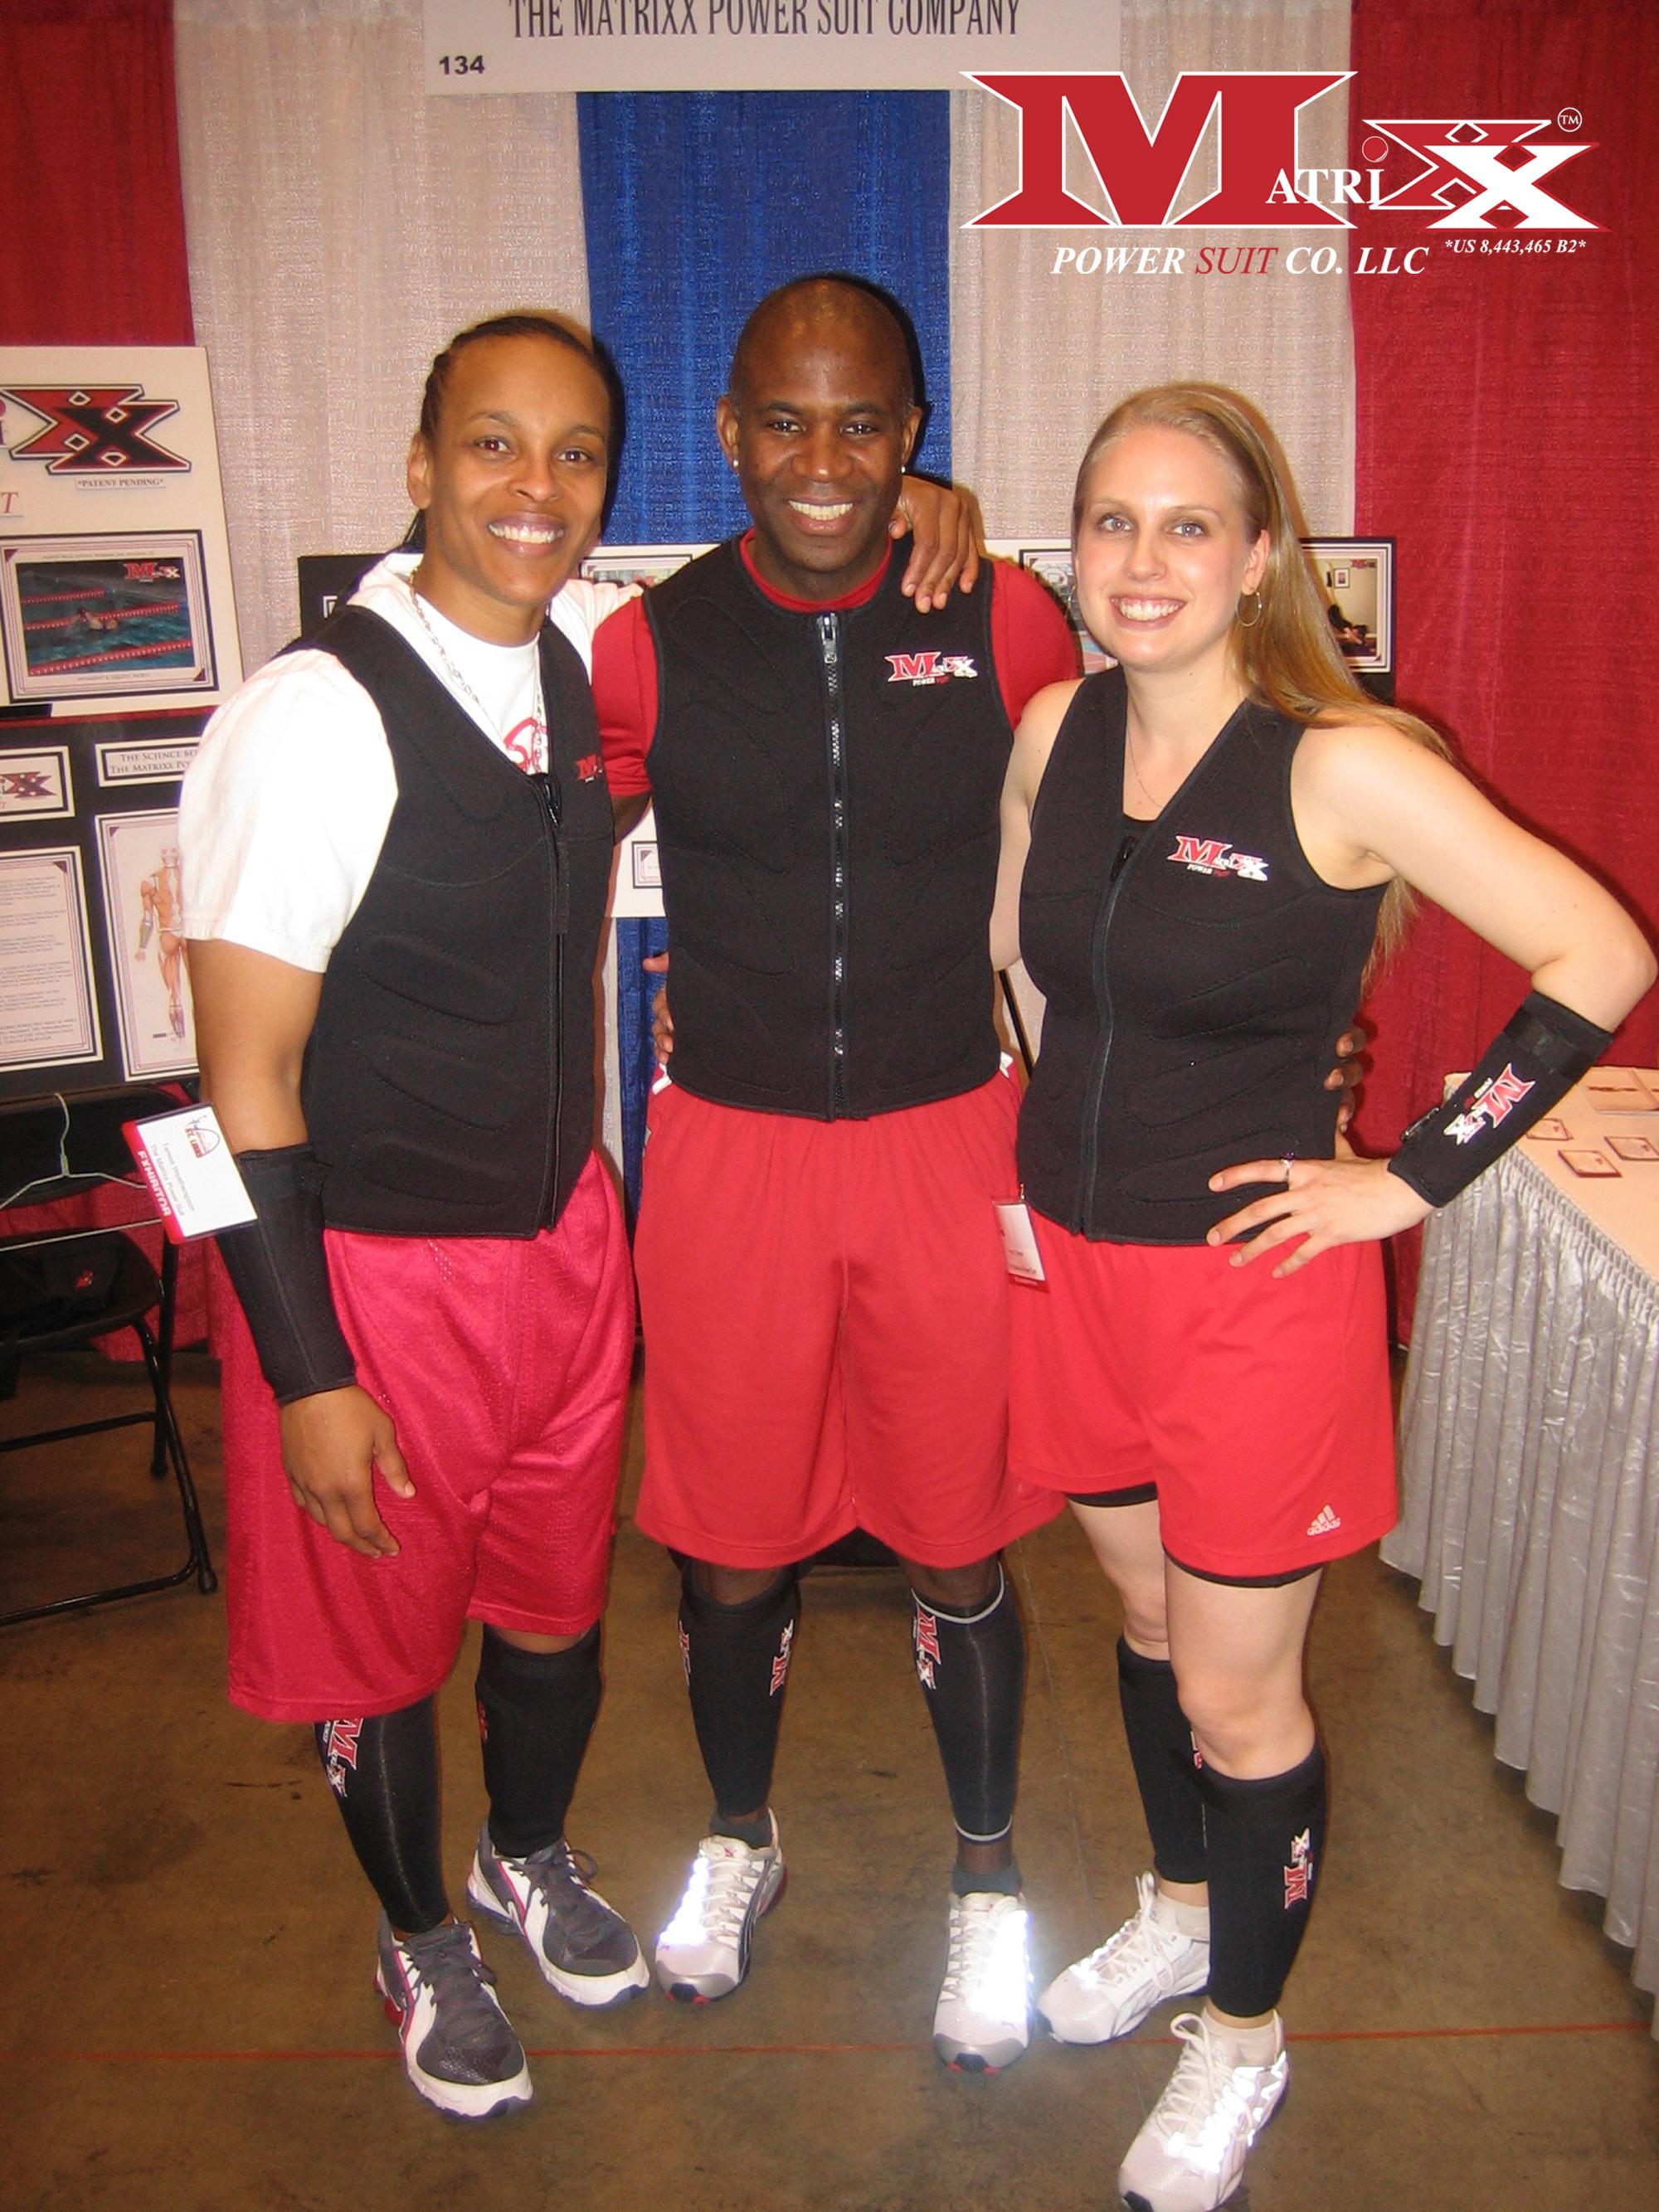 Former WNBA Star, Teresa Weatherspoon